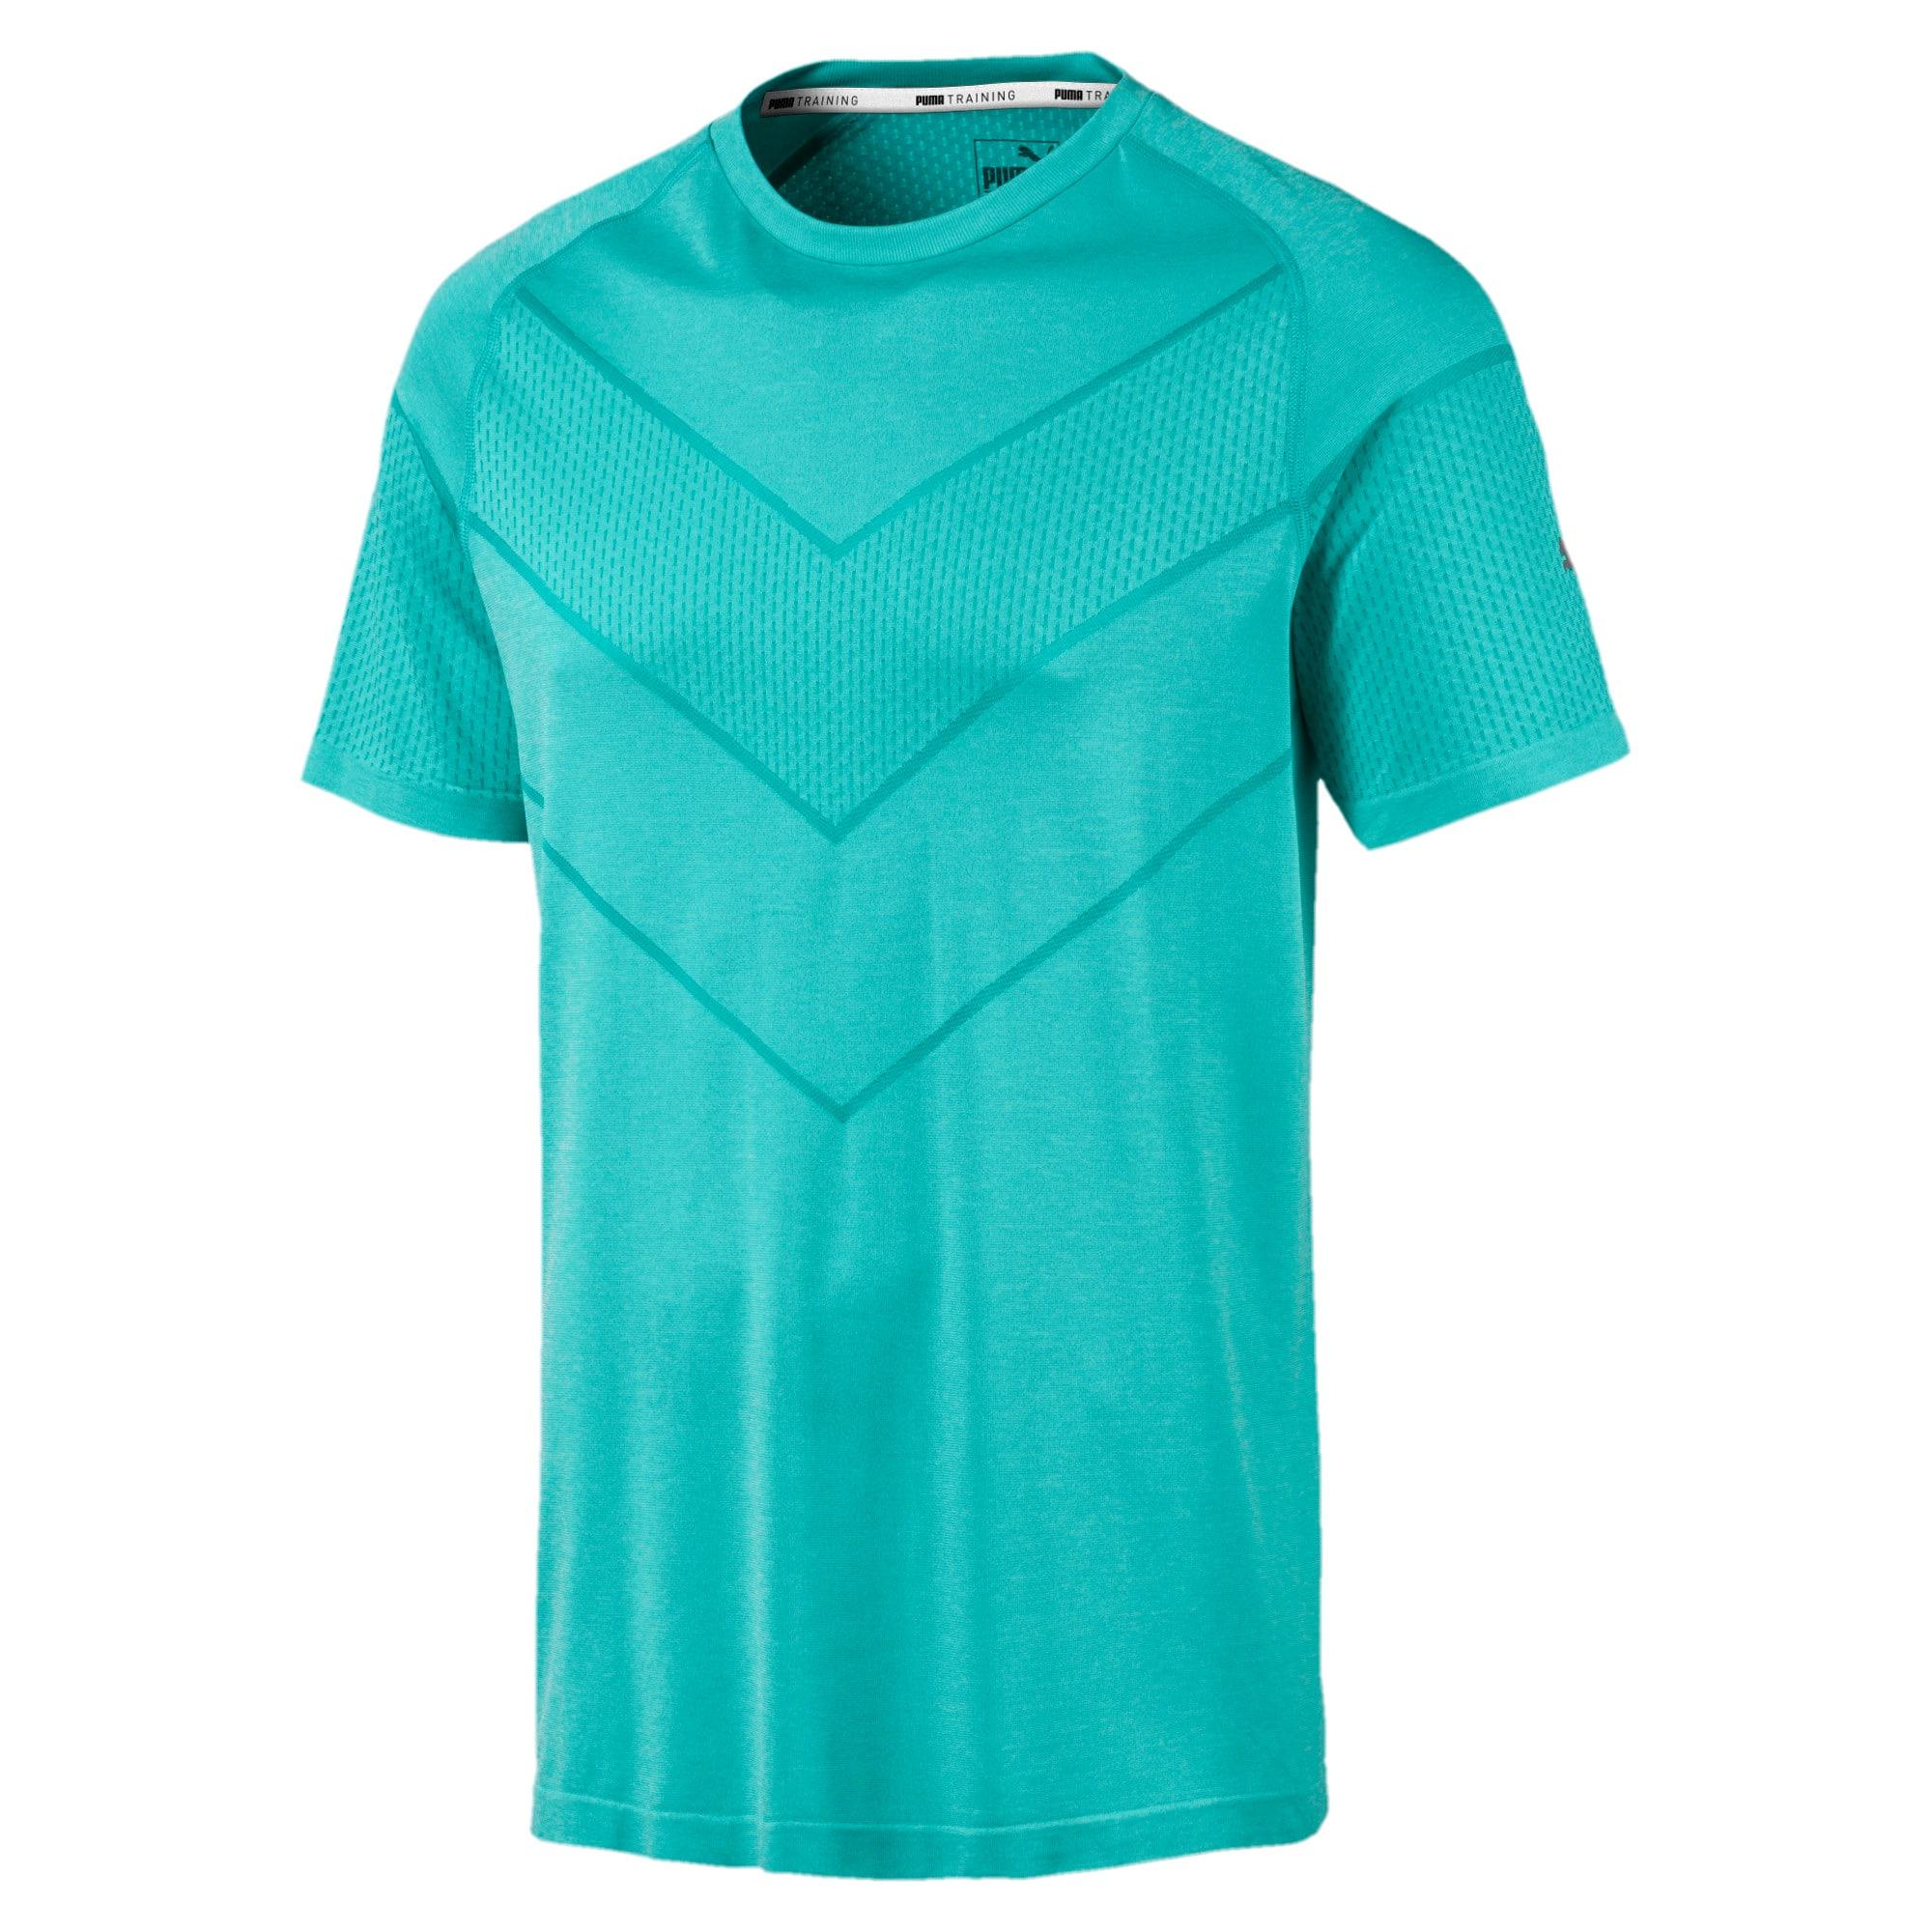 Thumbnail 4 of Reactive evoKNIT Herren T-Shirt, Blue Turquoise Heather, medium